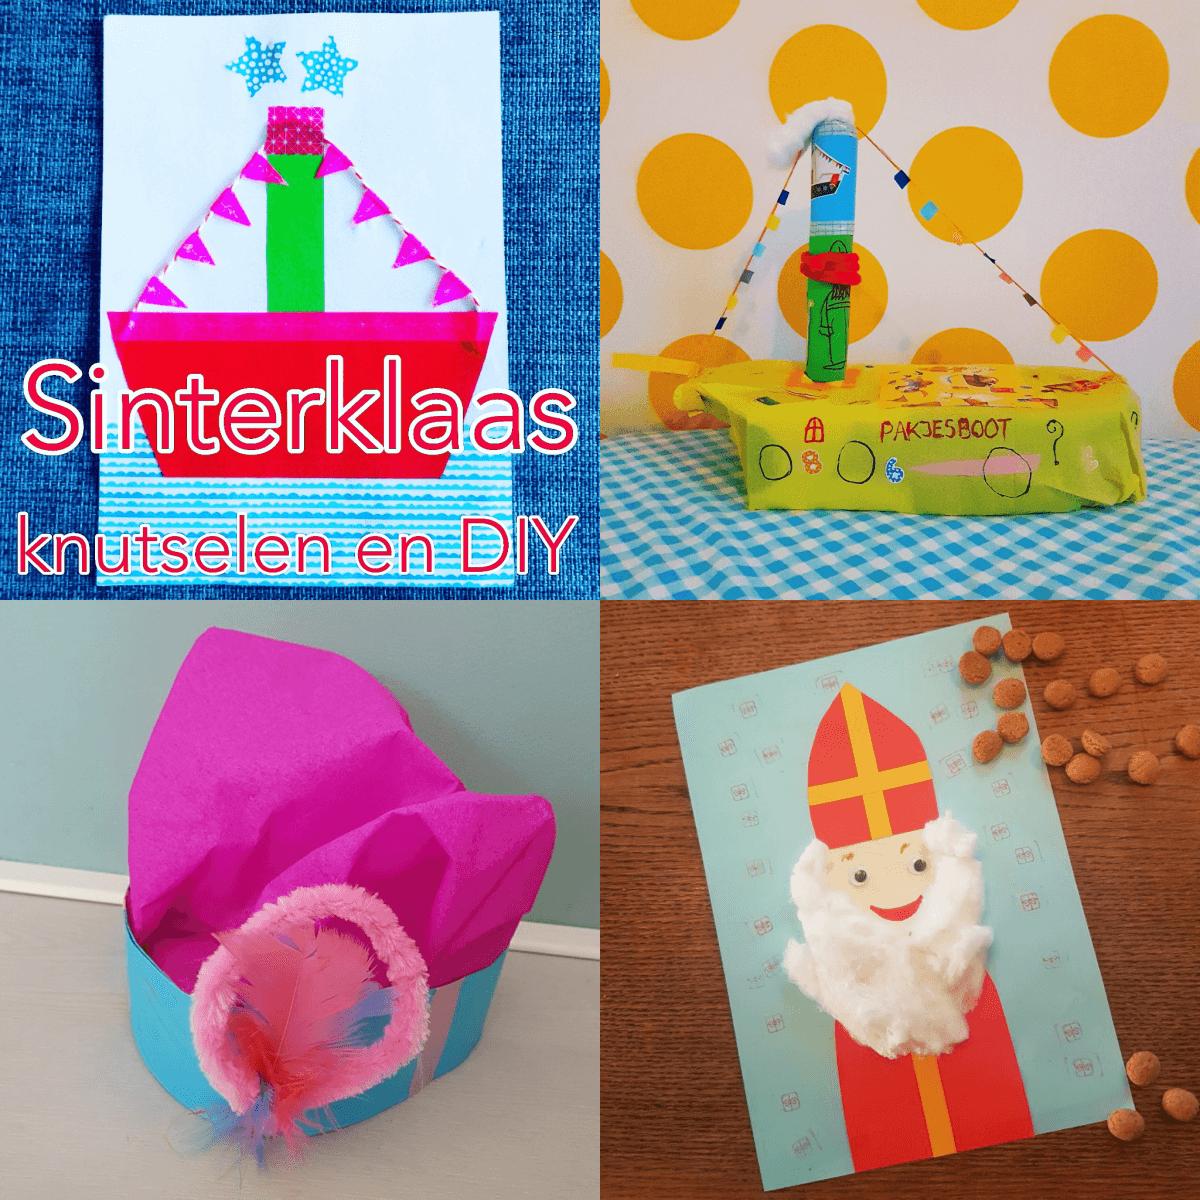 Sinterklaas: 101 ideeën om te knutselen